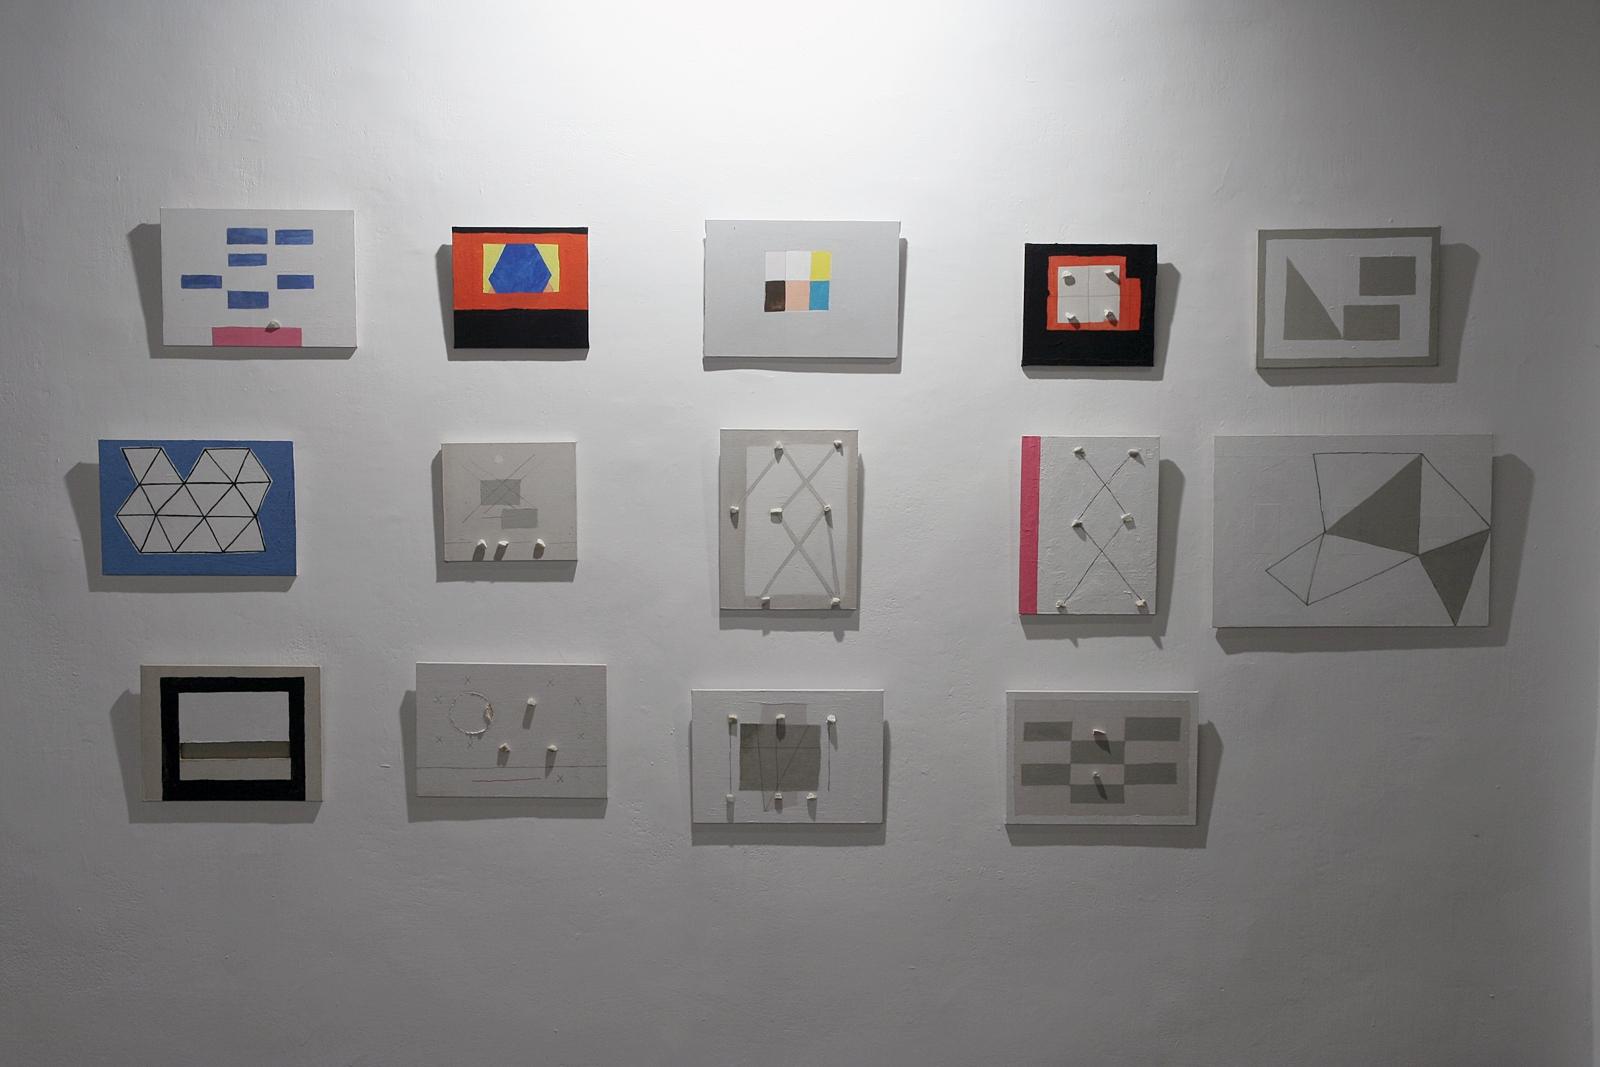 Koji Kamoji małe obrazy 2011-2015, fot.A.Rerak